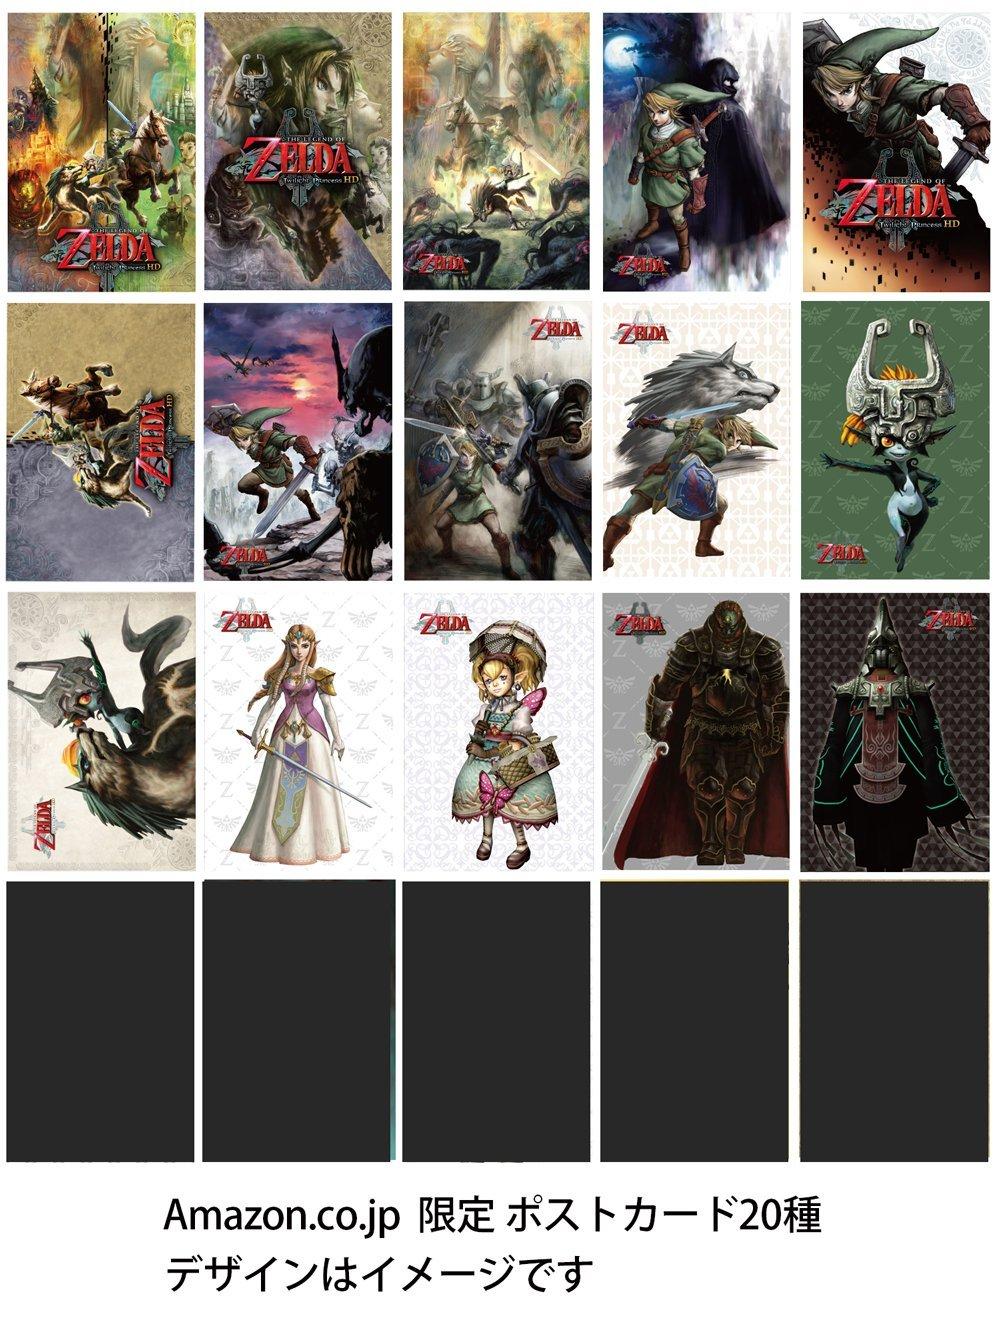 zelda-twilight-princess-hd-pre-order-amazon-jp